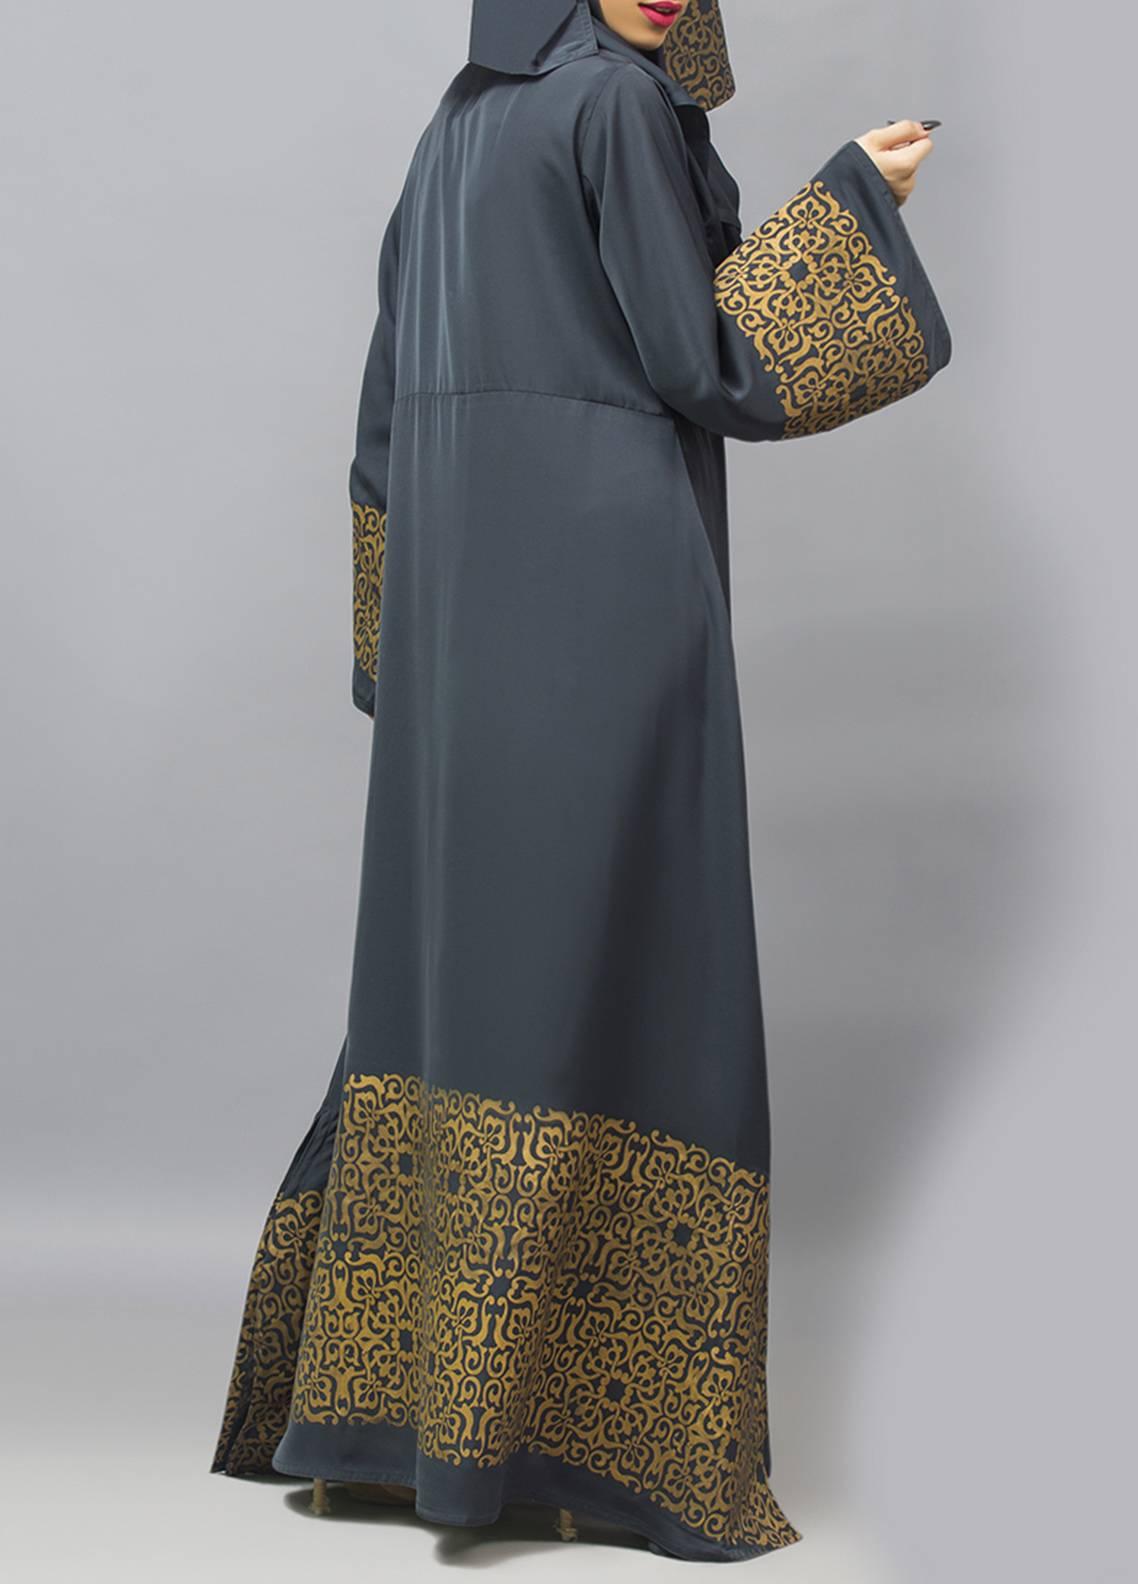 Hijab ul Hareem Pullover  Stitched Abaya 0120-R-963